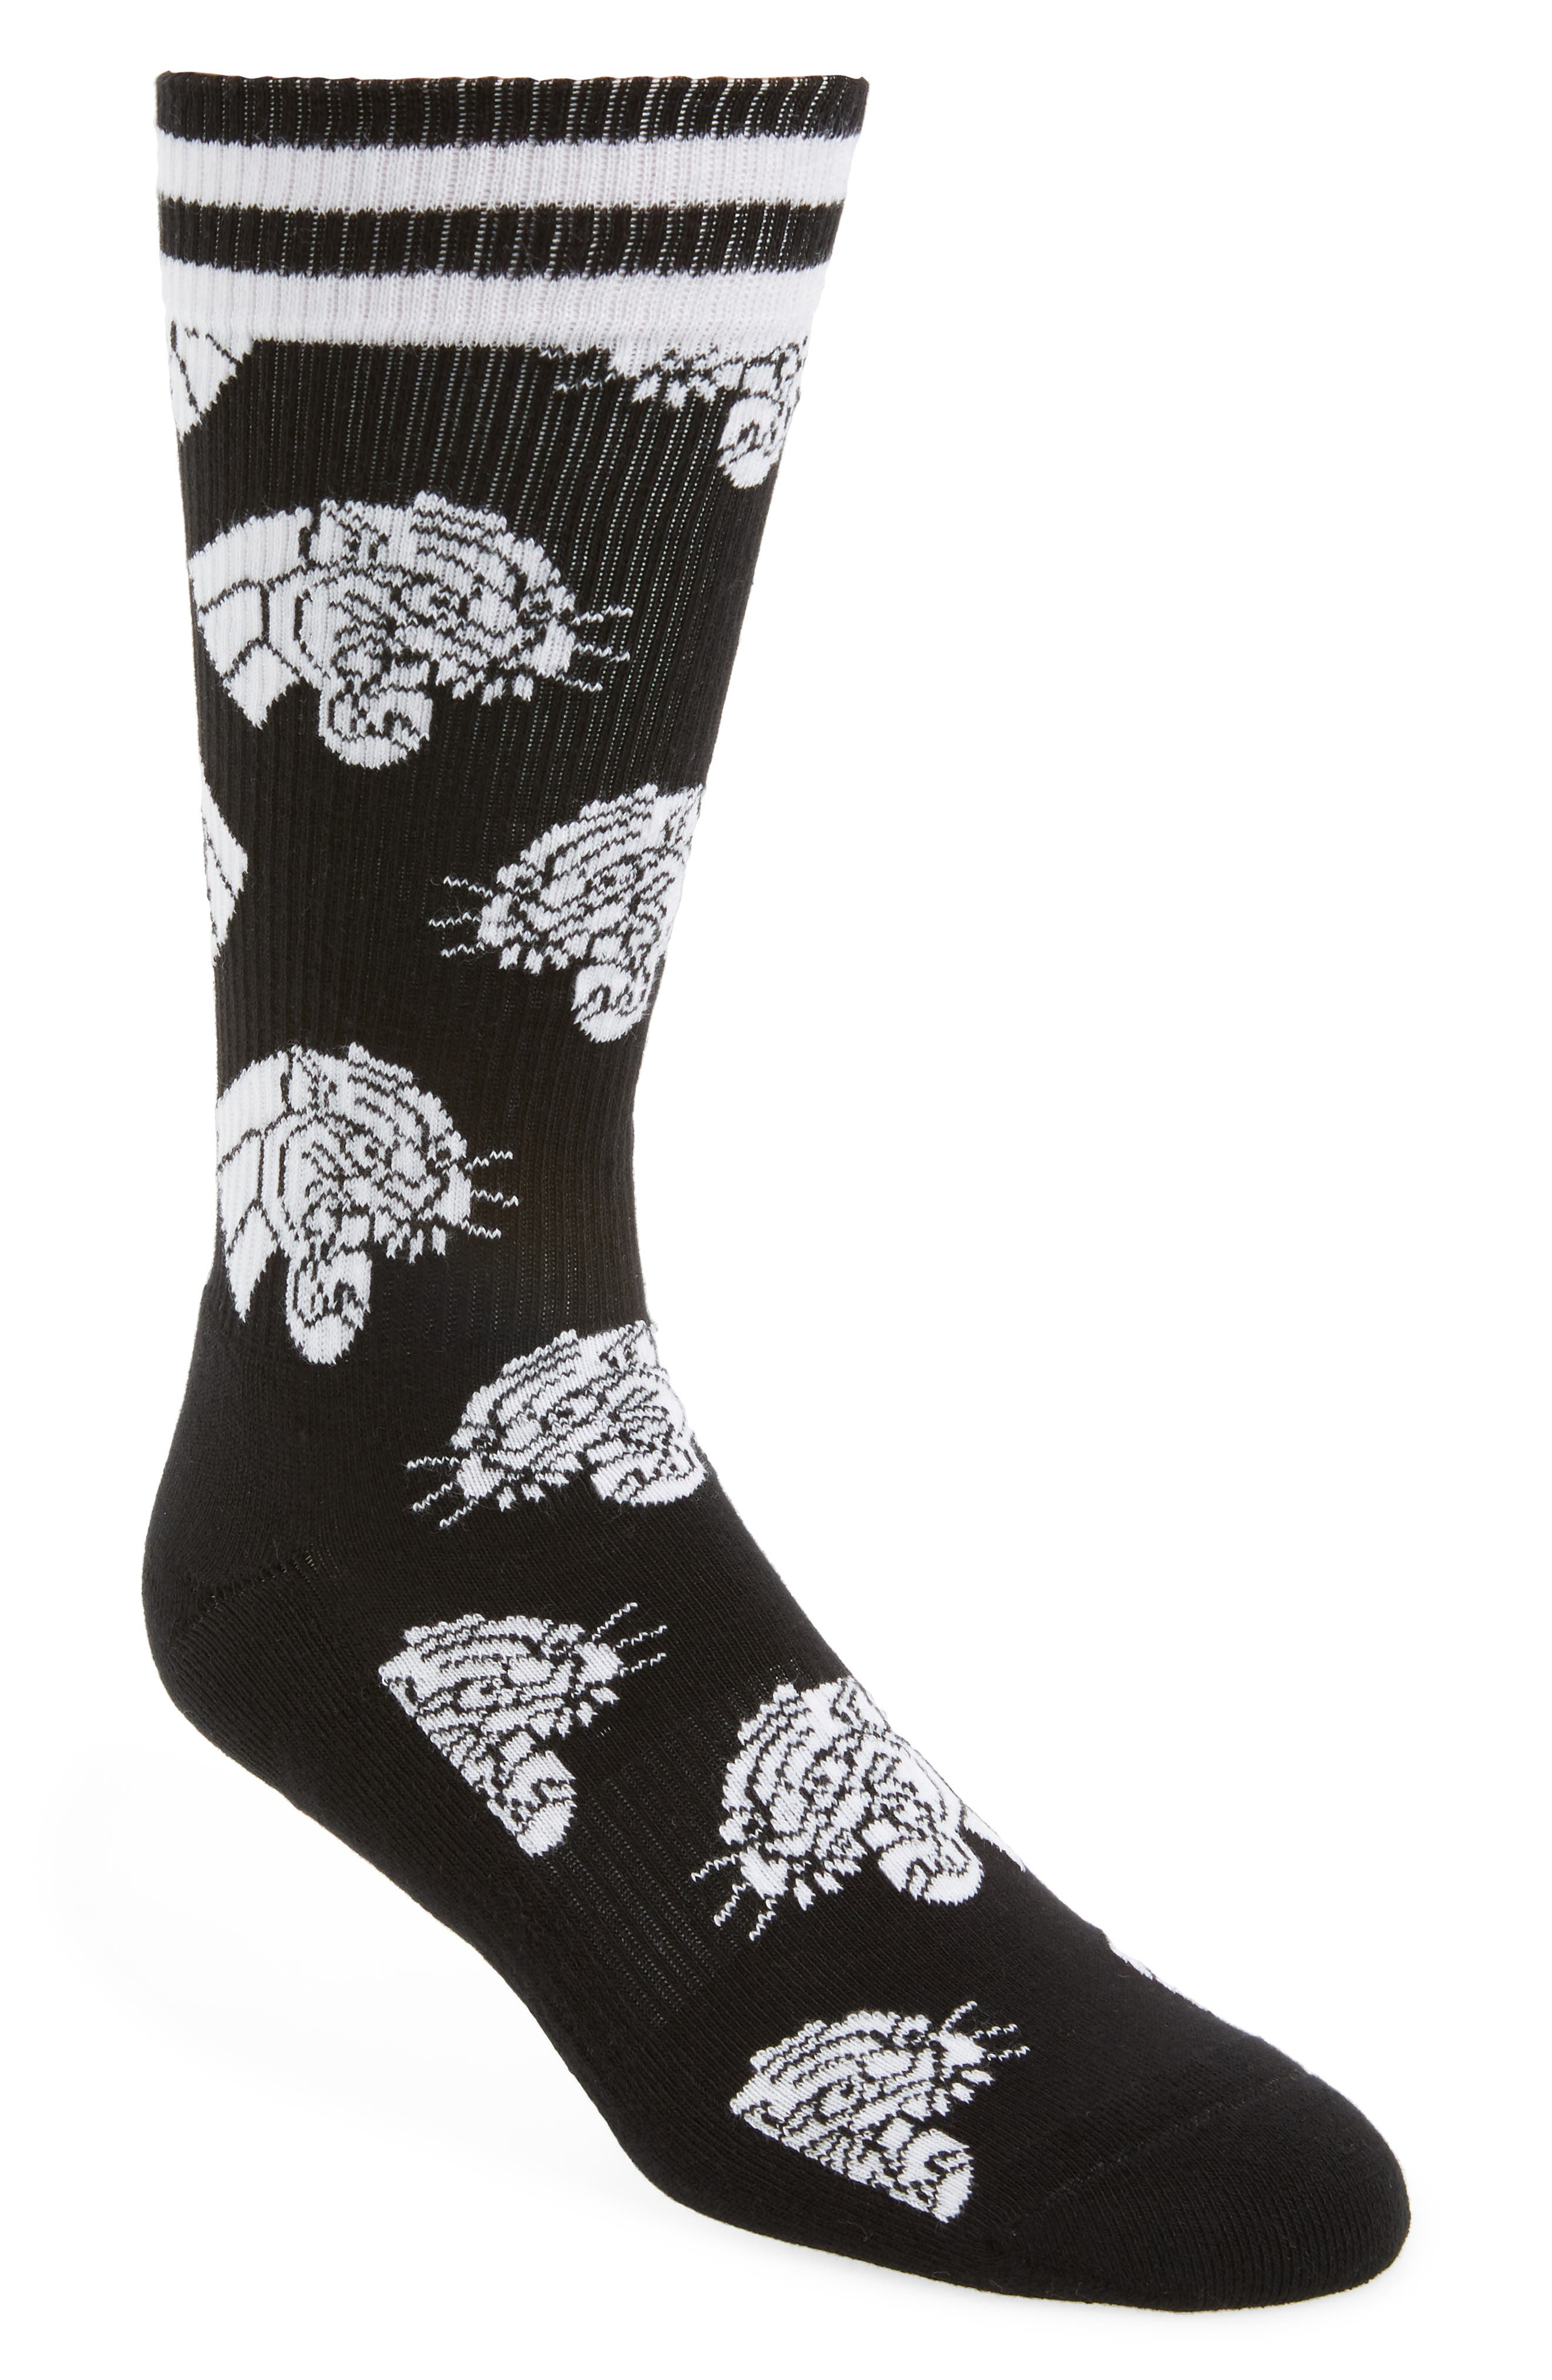 Athletic Mountain Lion Socks,                         Main,                         color, BLACK